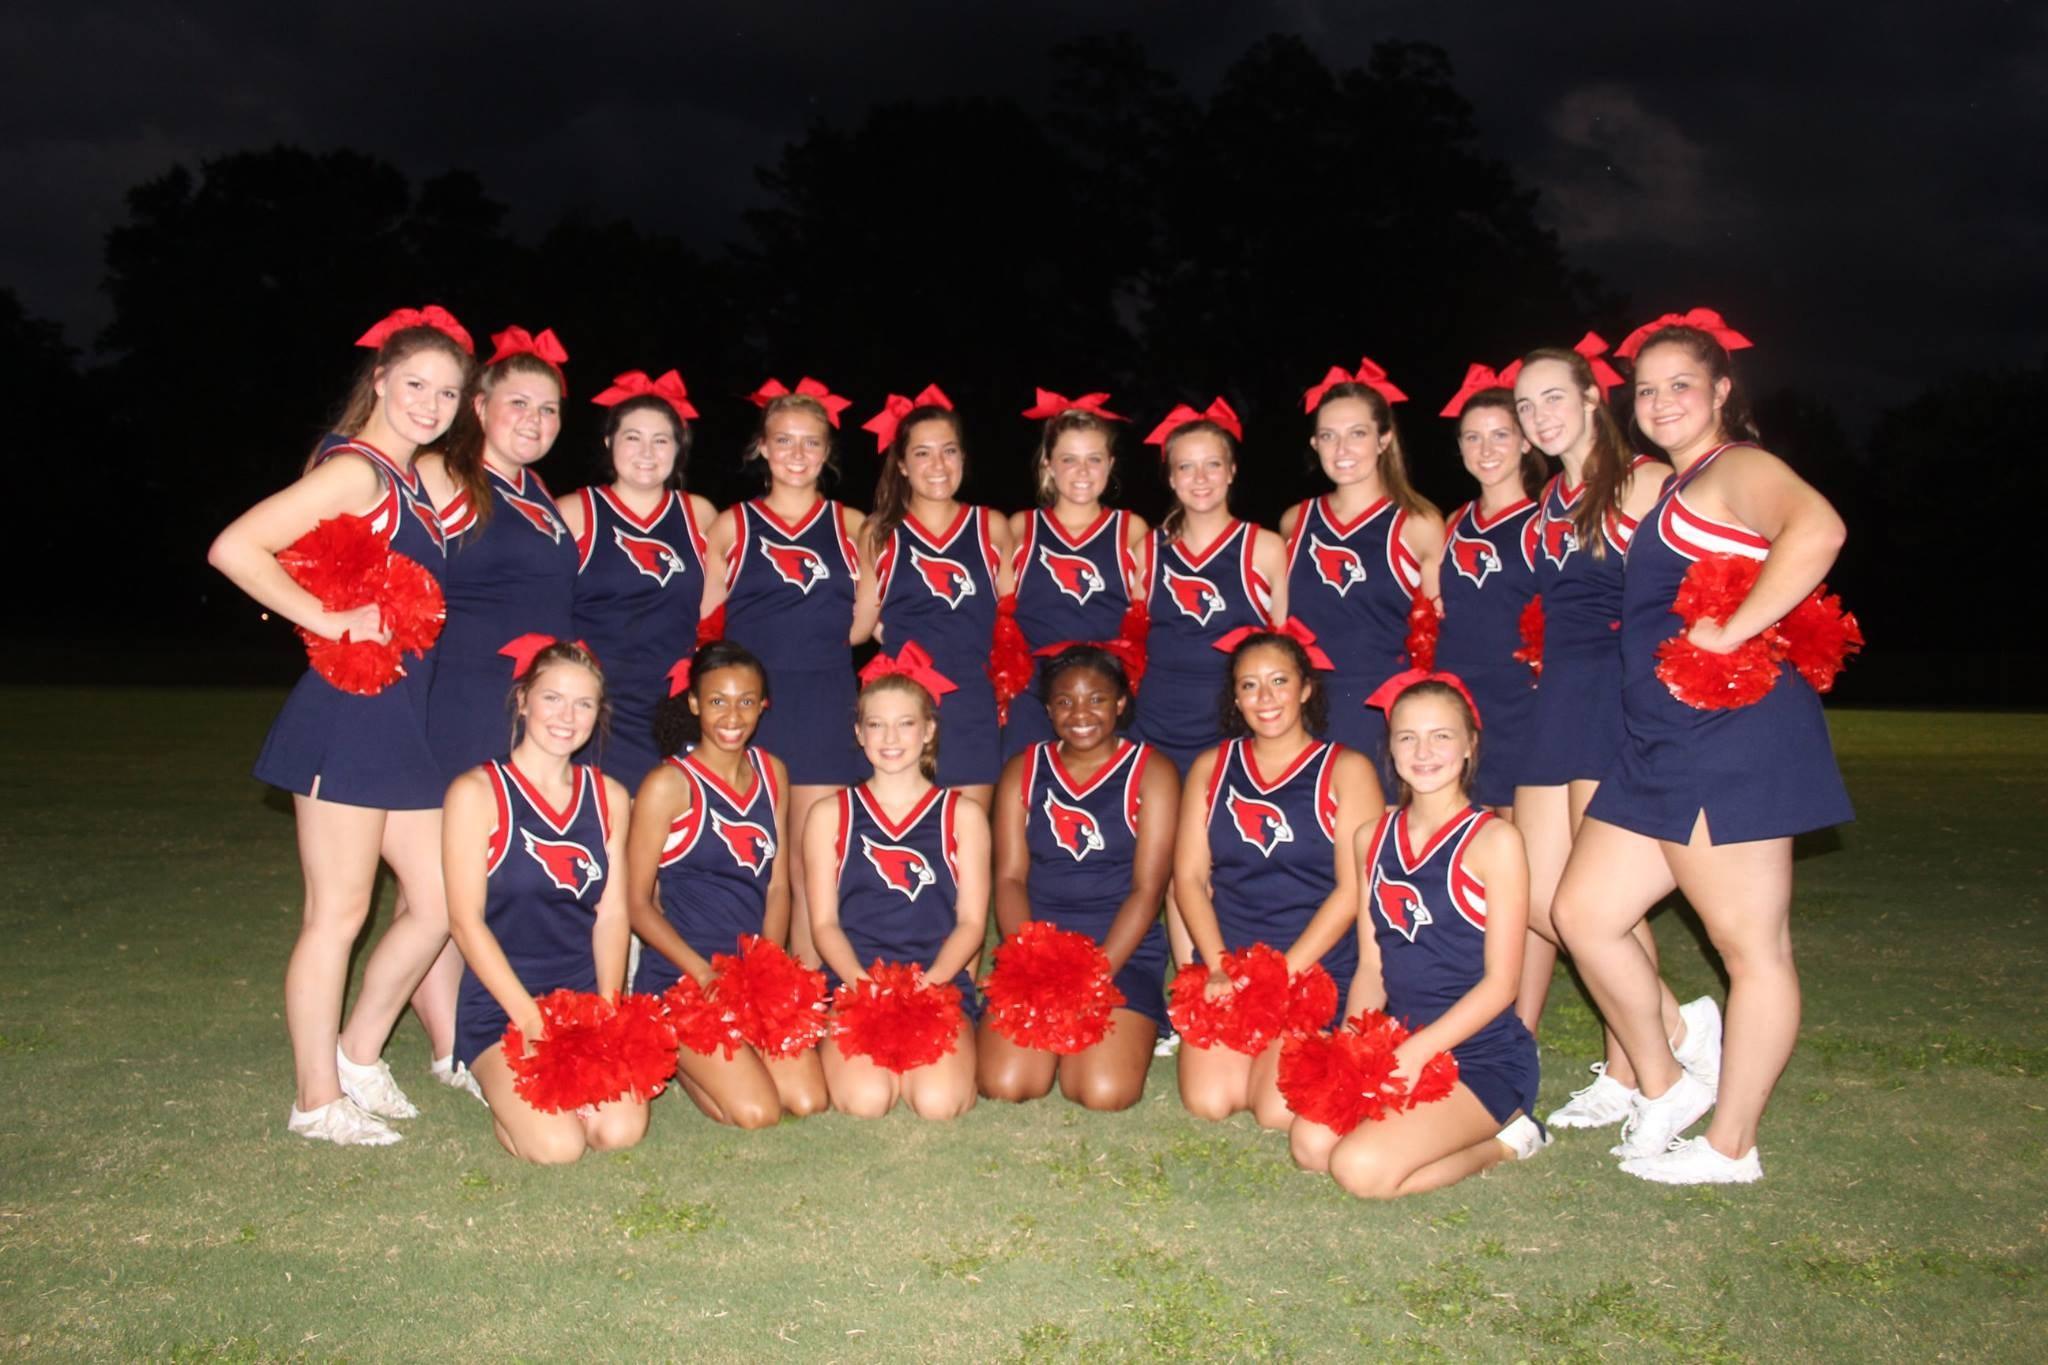 Cheerleading miscellaneous union academy charter school varsity cheer 1betcityfo Choice Image